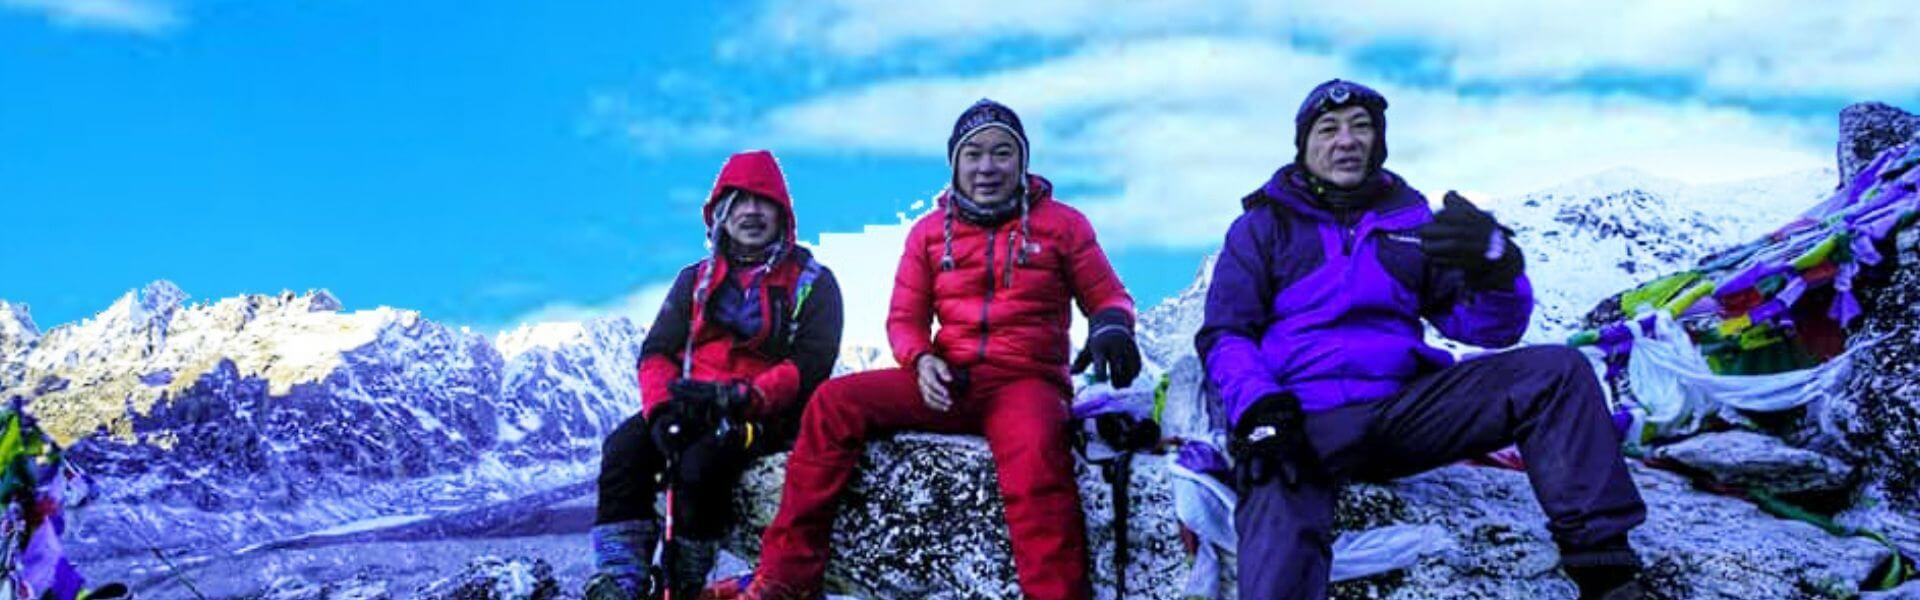 Everest Base Camp Trekking Solo